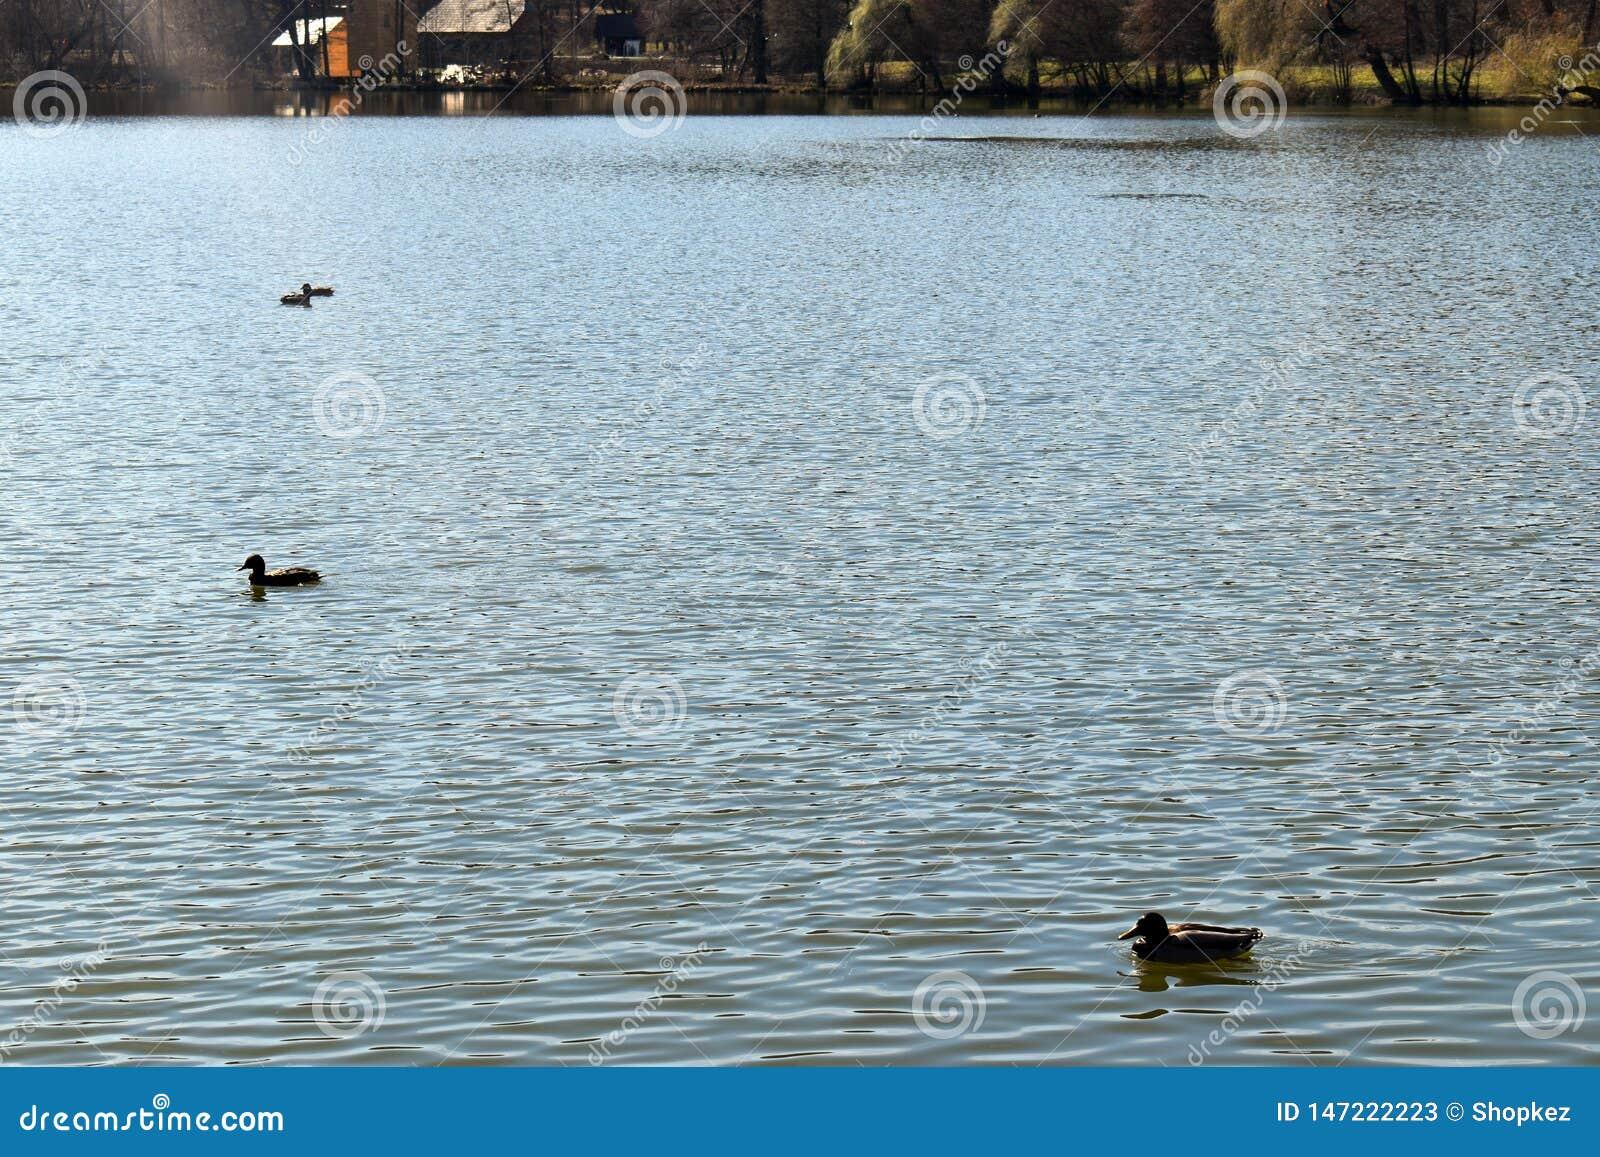 Ducks family swimming on the shining lake at sunset